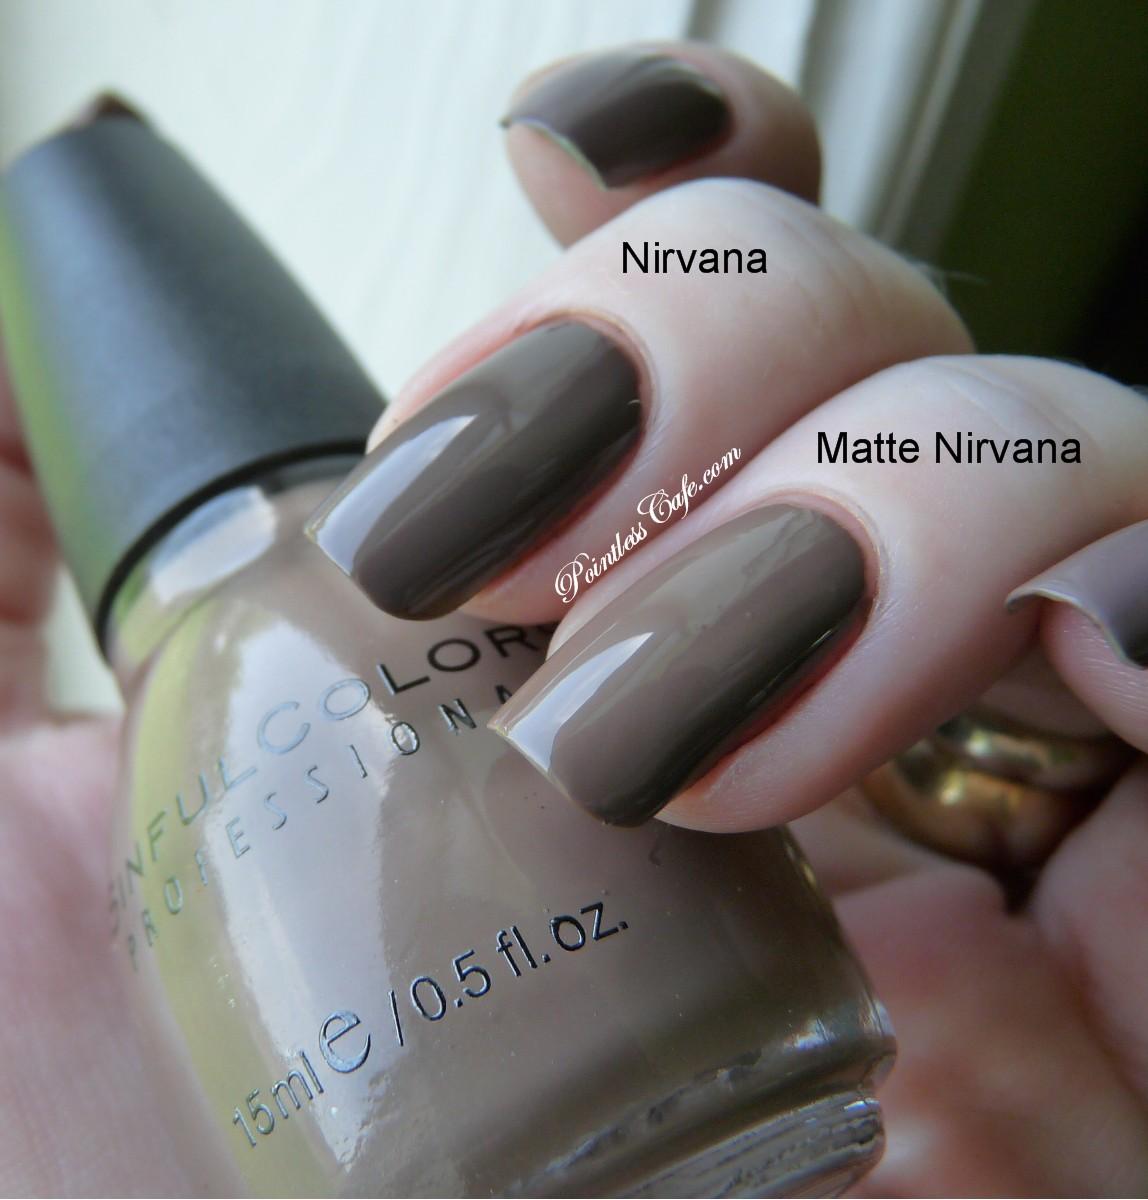 Sinful Colors Nirvana vs Matte Nirvana | Pointless Cafe